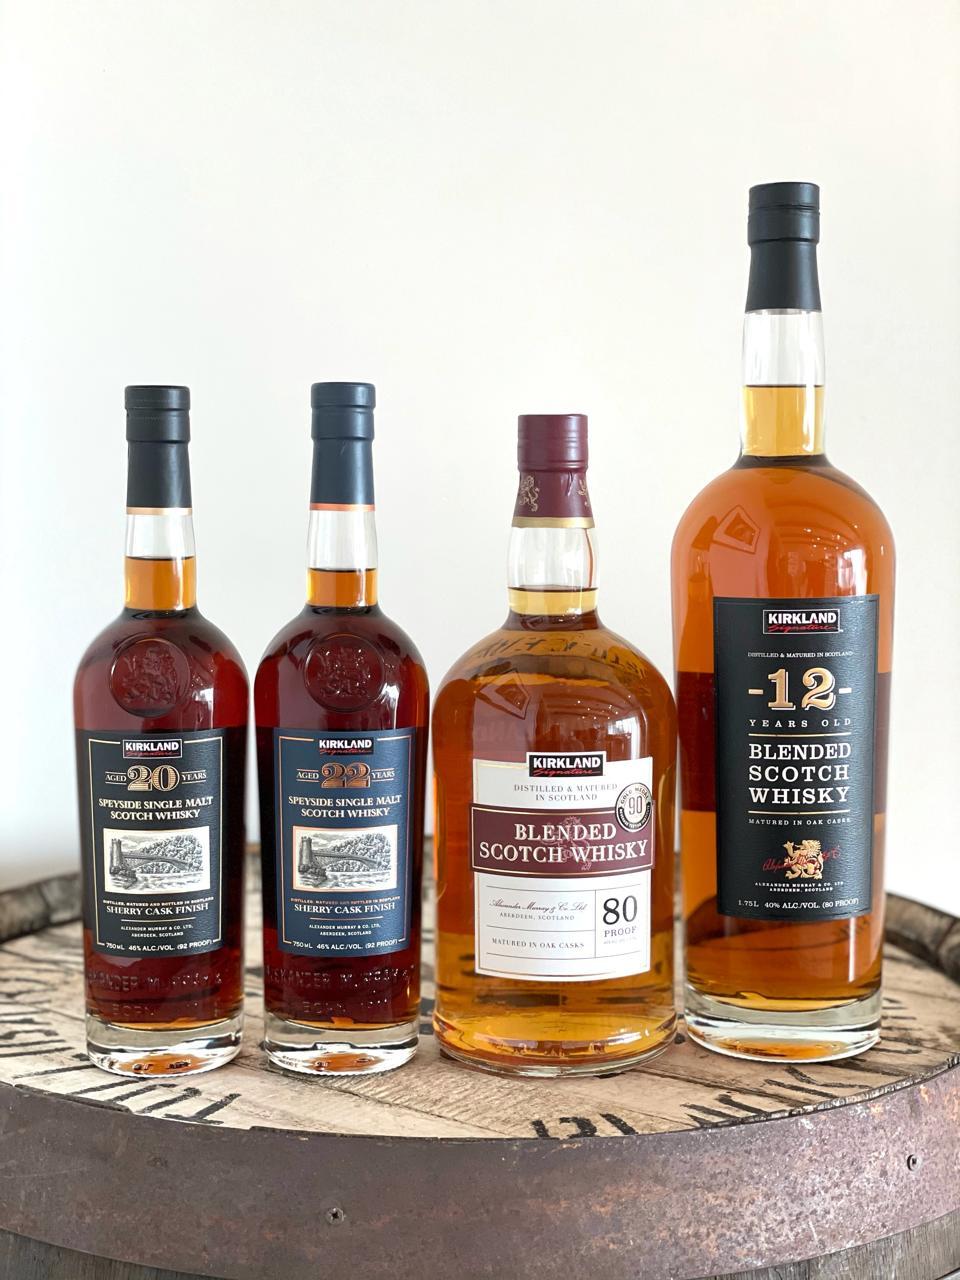 The Kirkland Signature Scotch Whisky Range